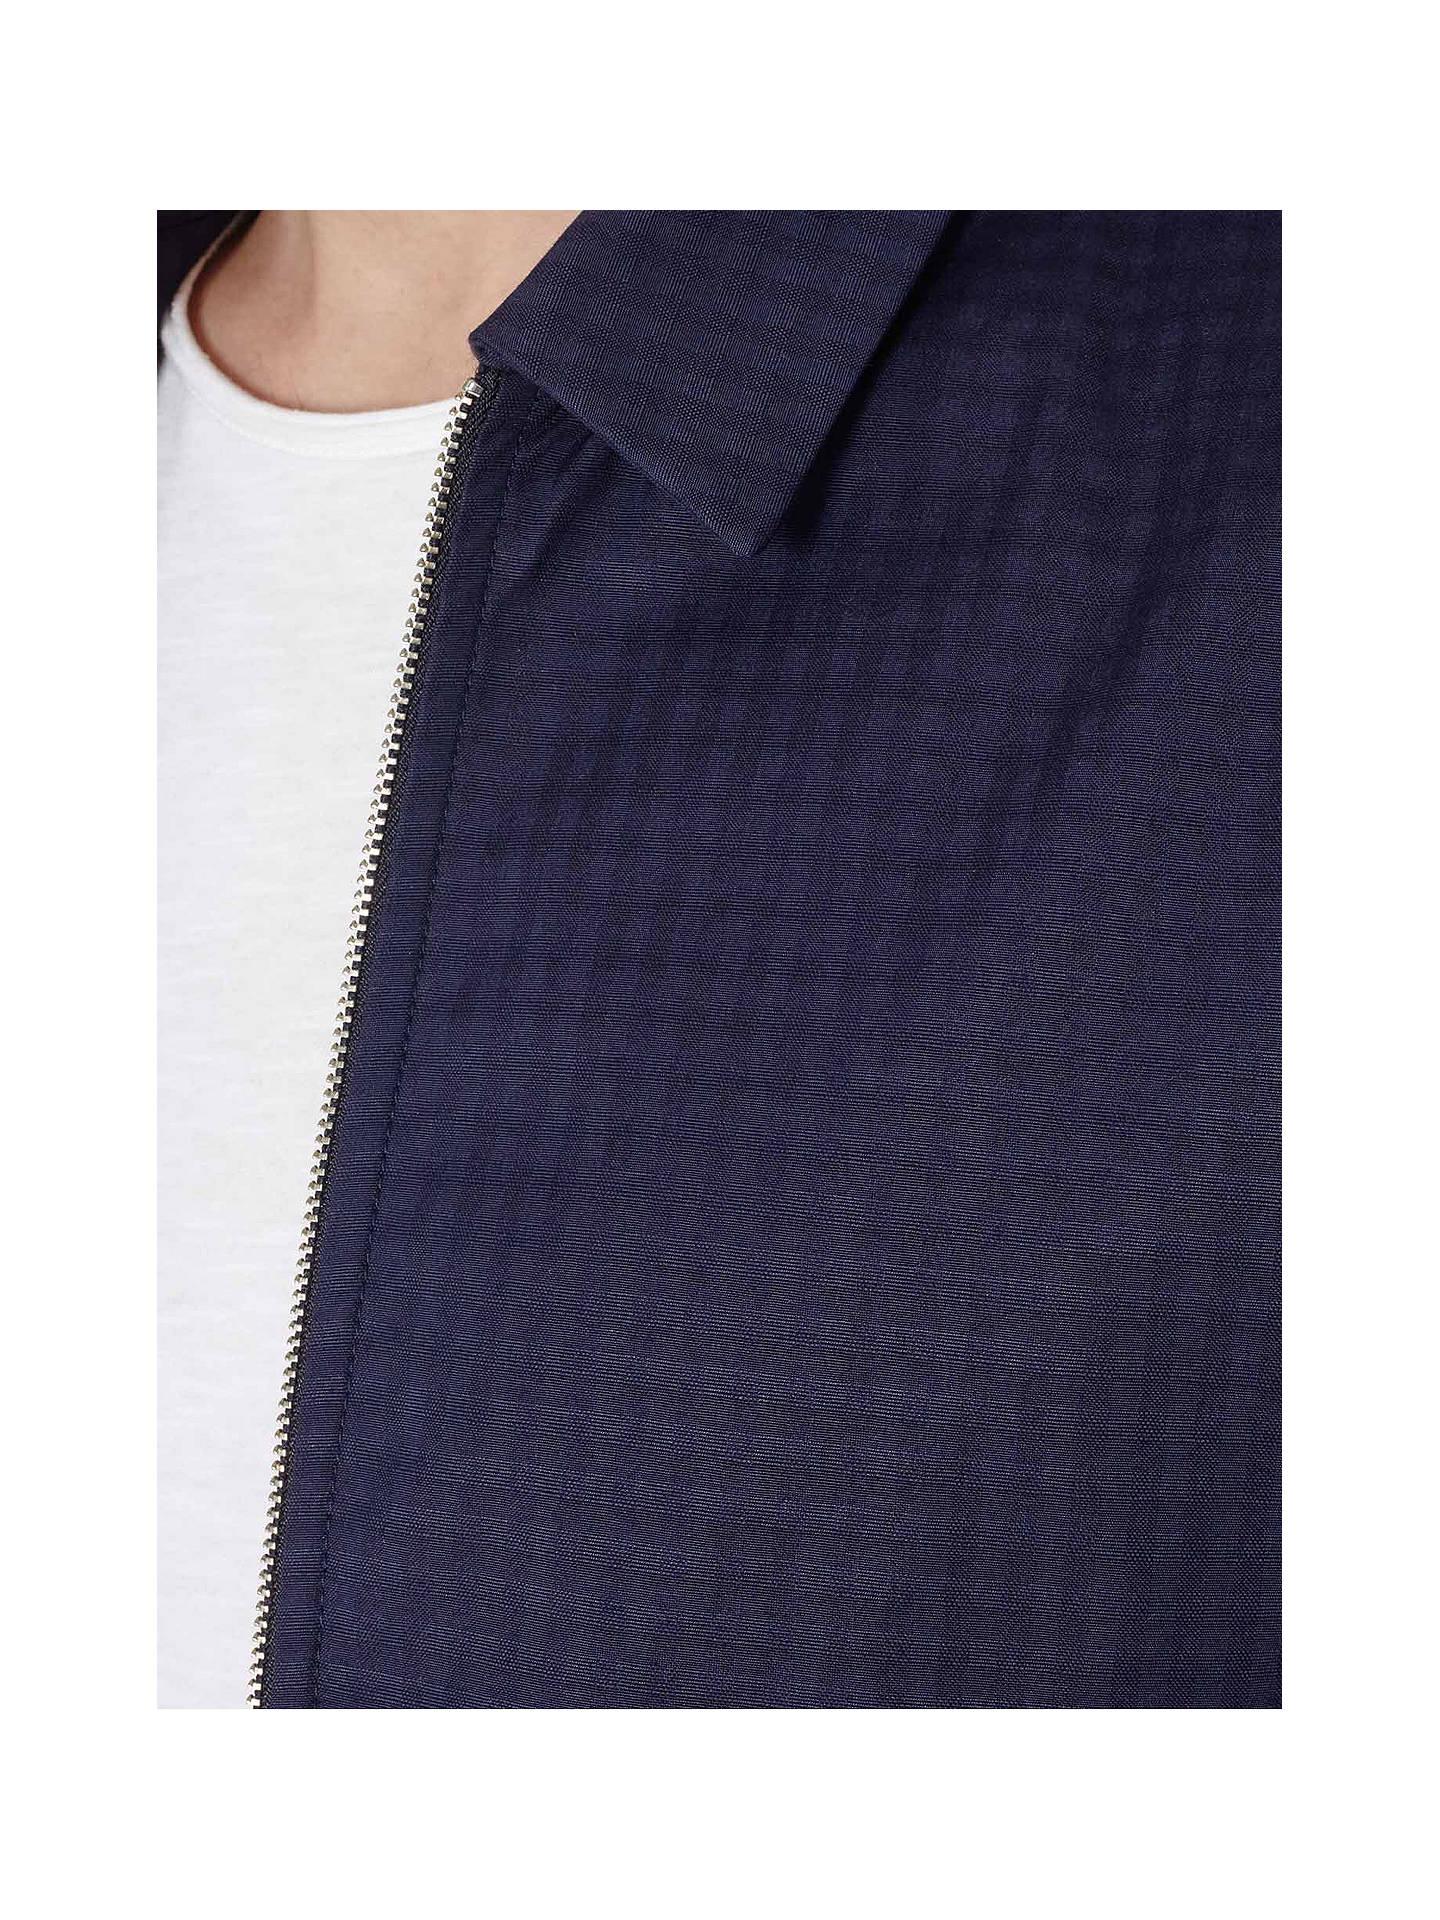 921a18f6c ... Buy Reiss Rocco Check Harrington Jacket, Blue, XS Online at  johnlewis.com